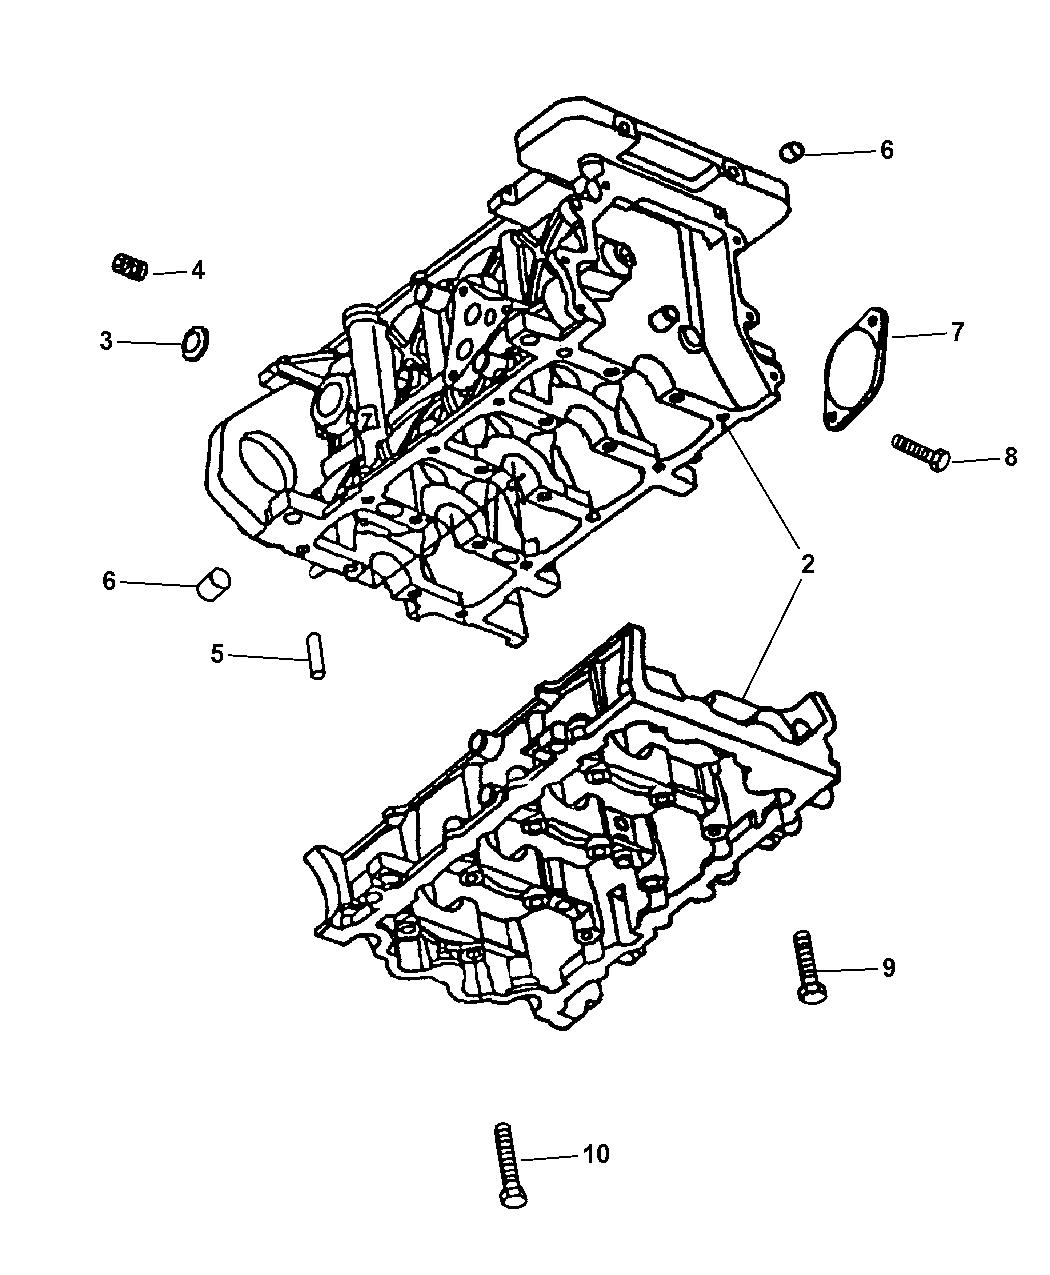 2006 Chrysler Pt Cruiser Cylinder Block Related Parts Engine Diagram Thumbnail 1